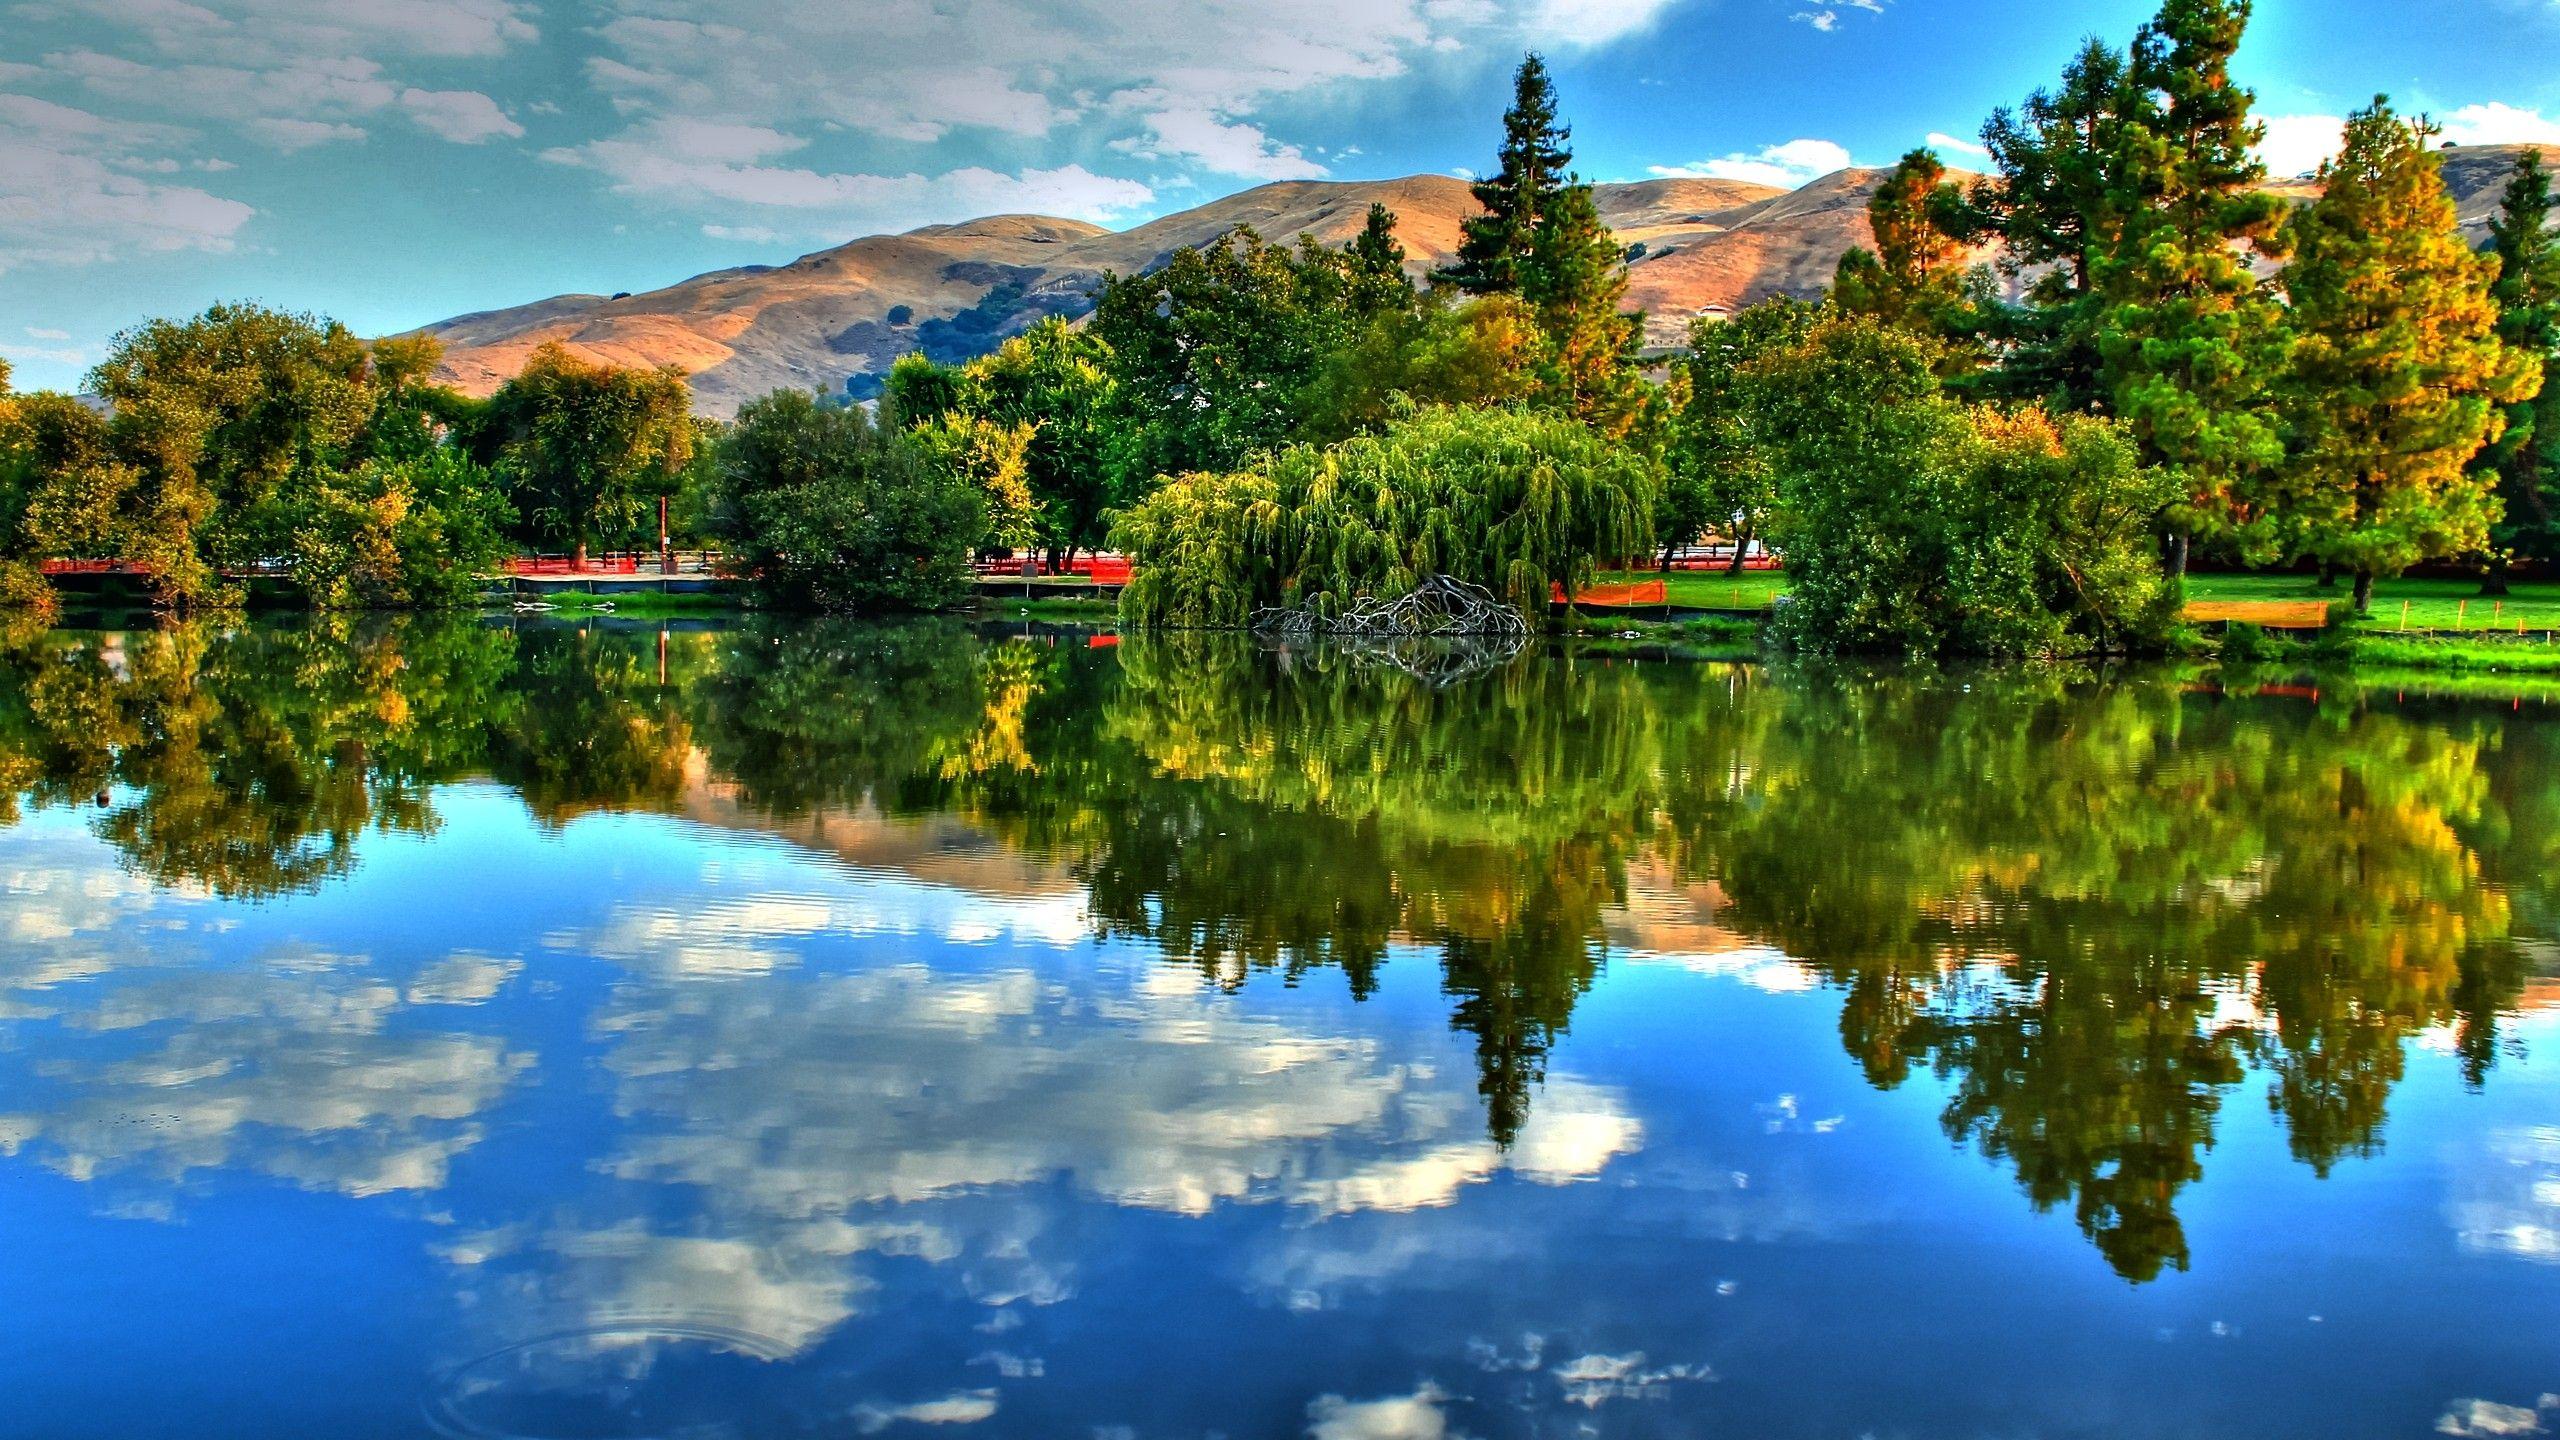 2560x1440 Landscape Wallpaper Landscape Wallpaper Landscape Photography Scenic Wallpaper